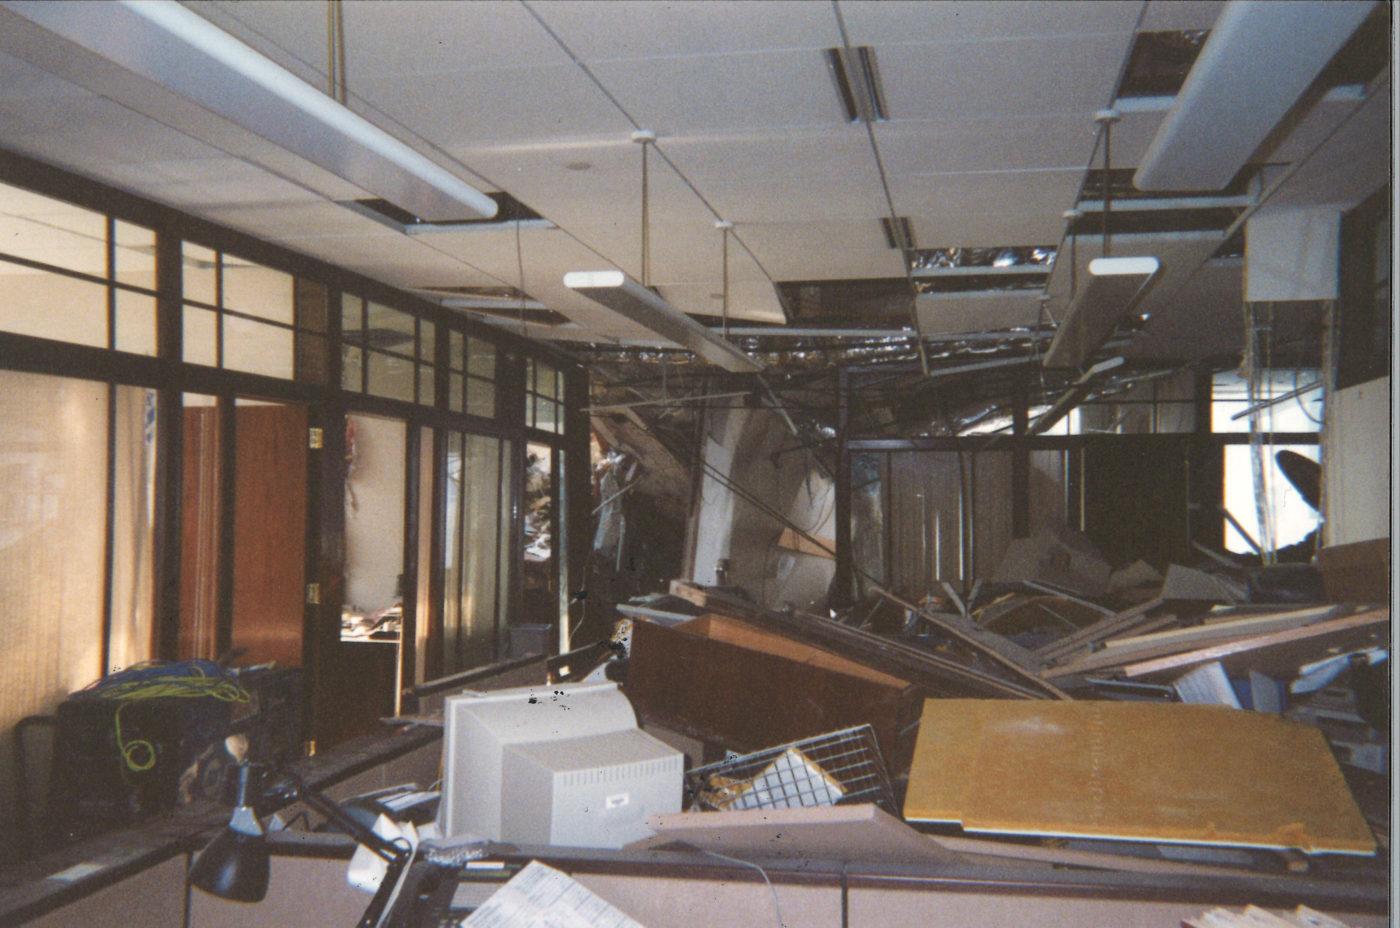 Interior office damage at 200 Vesey Street